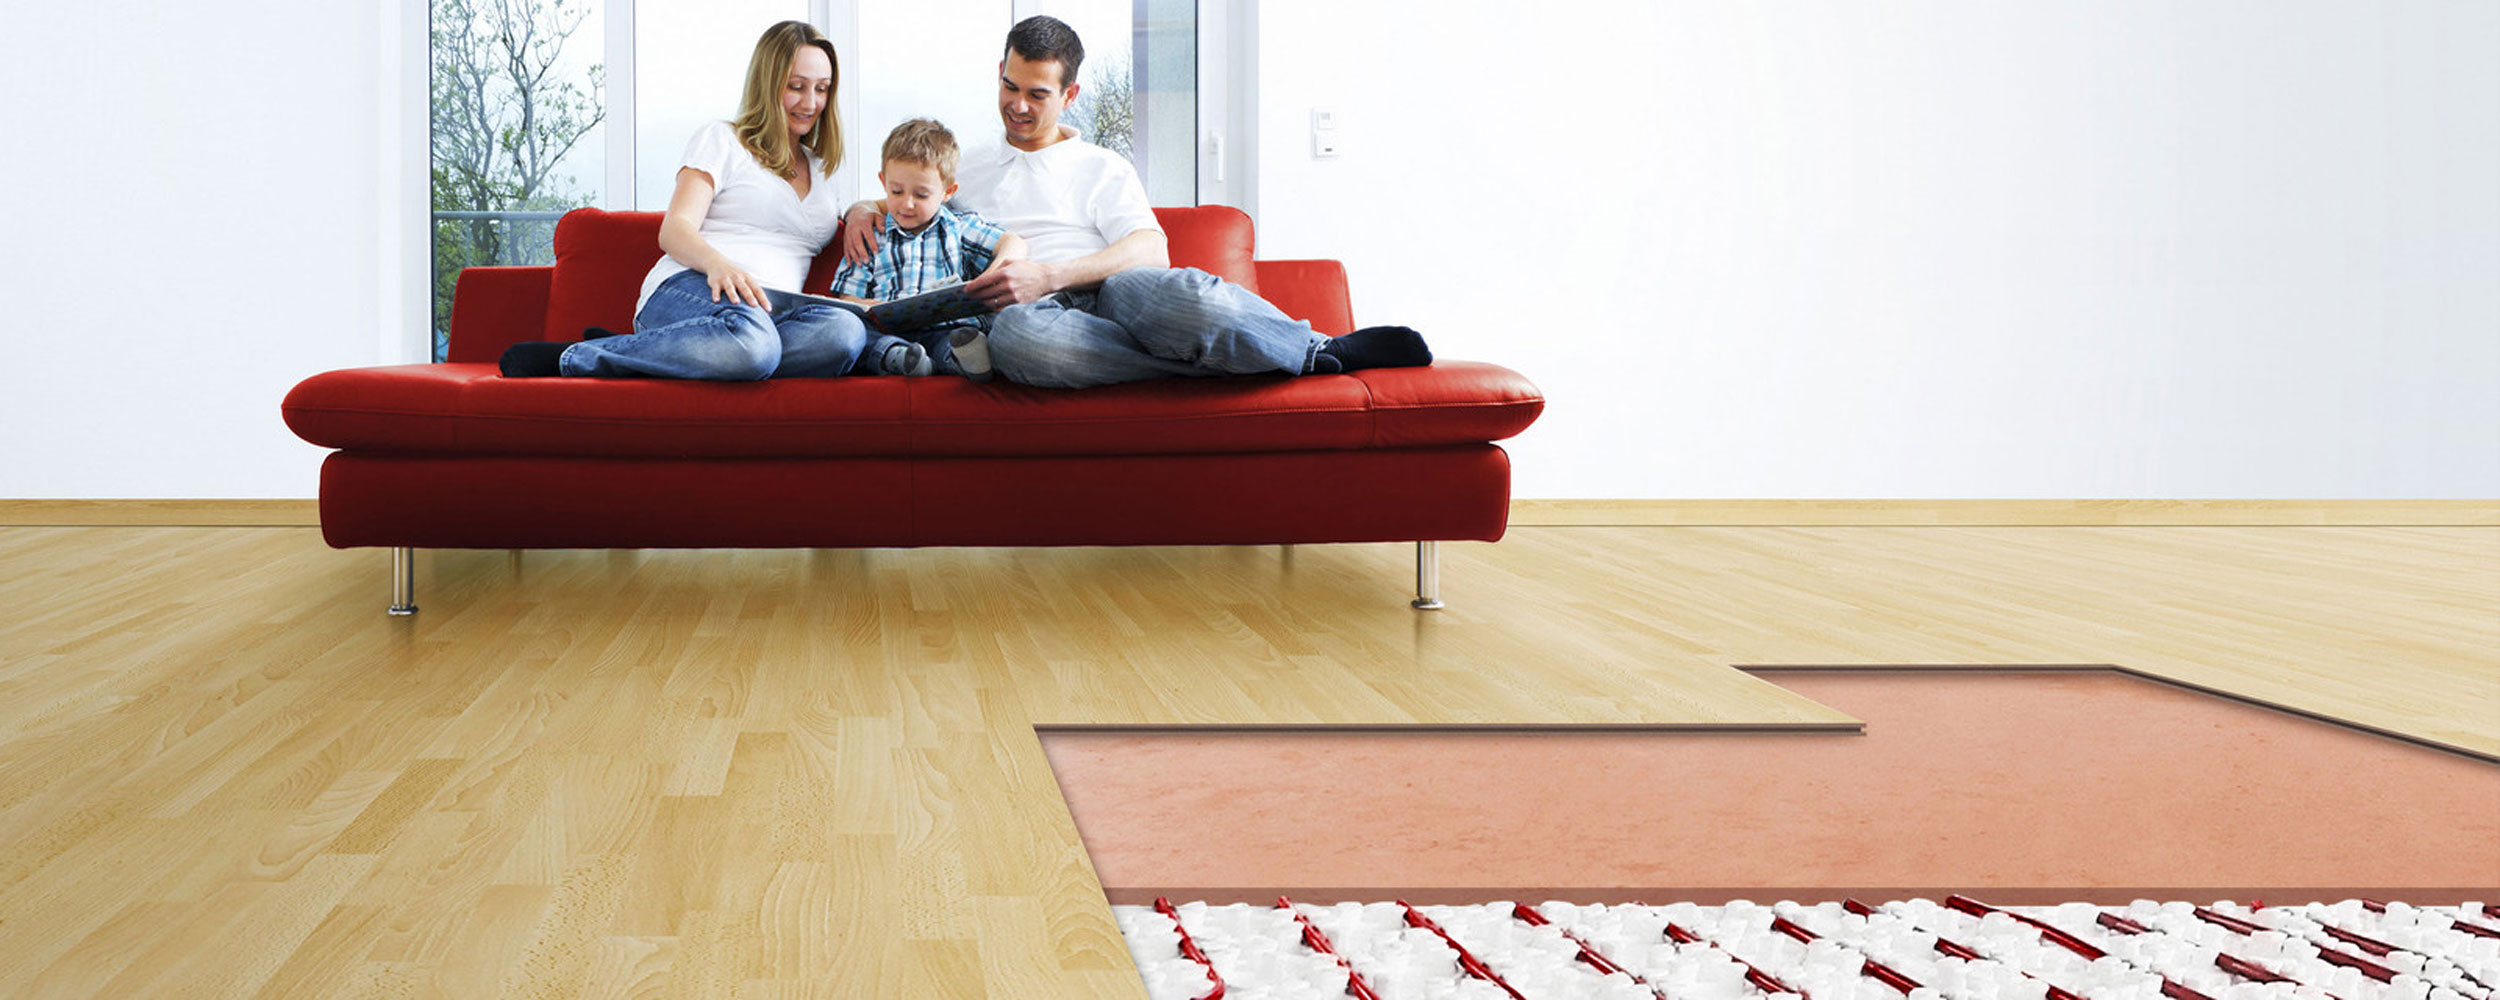 temps de sechage chape liquide avant carrelage chape liquide ciment sechage 19 chape liquide. Black Bedroom Furniture Sets. Home Design Ideas